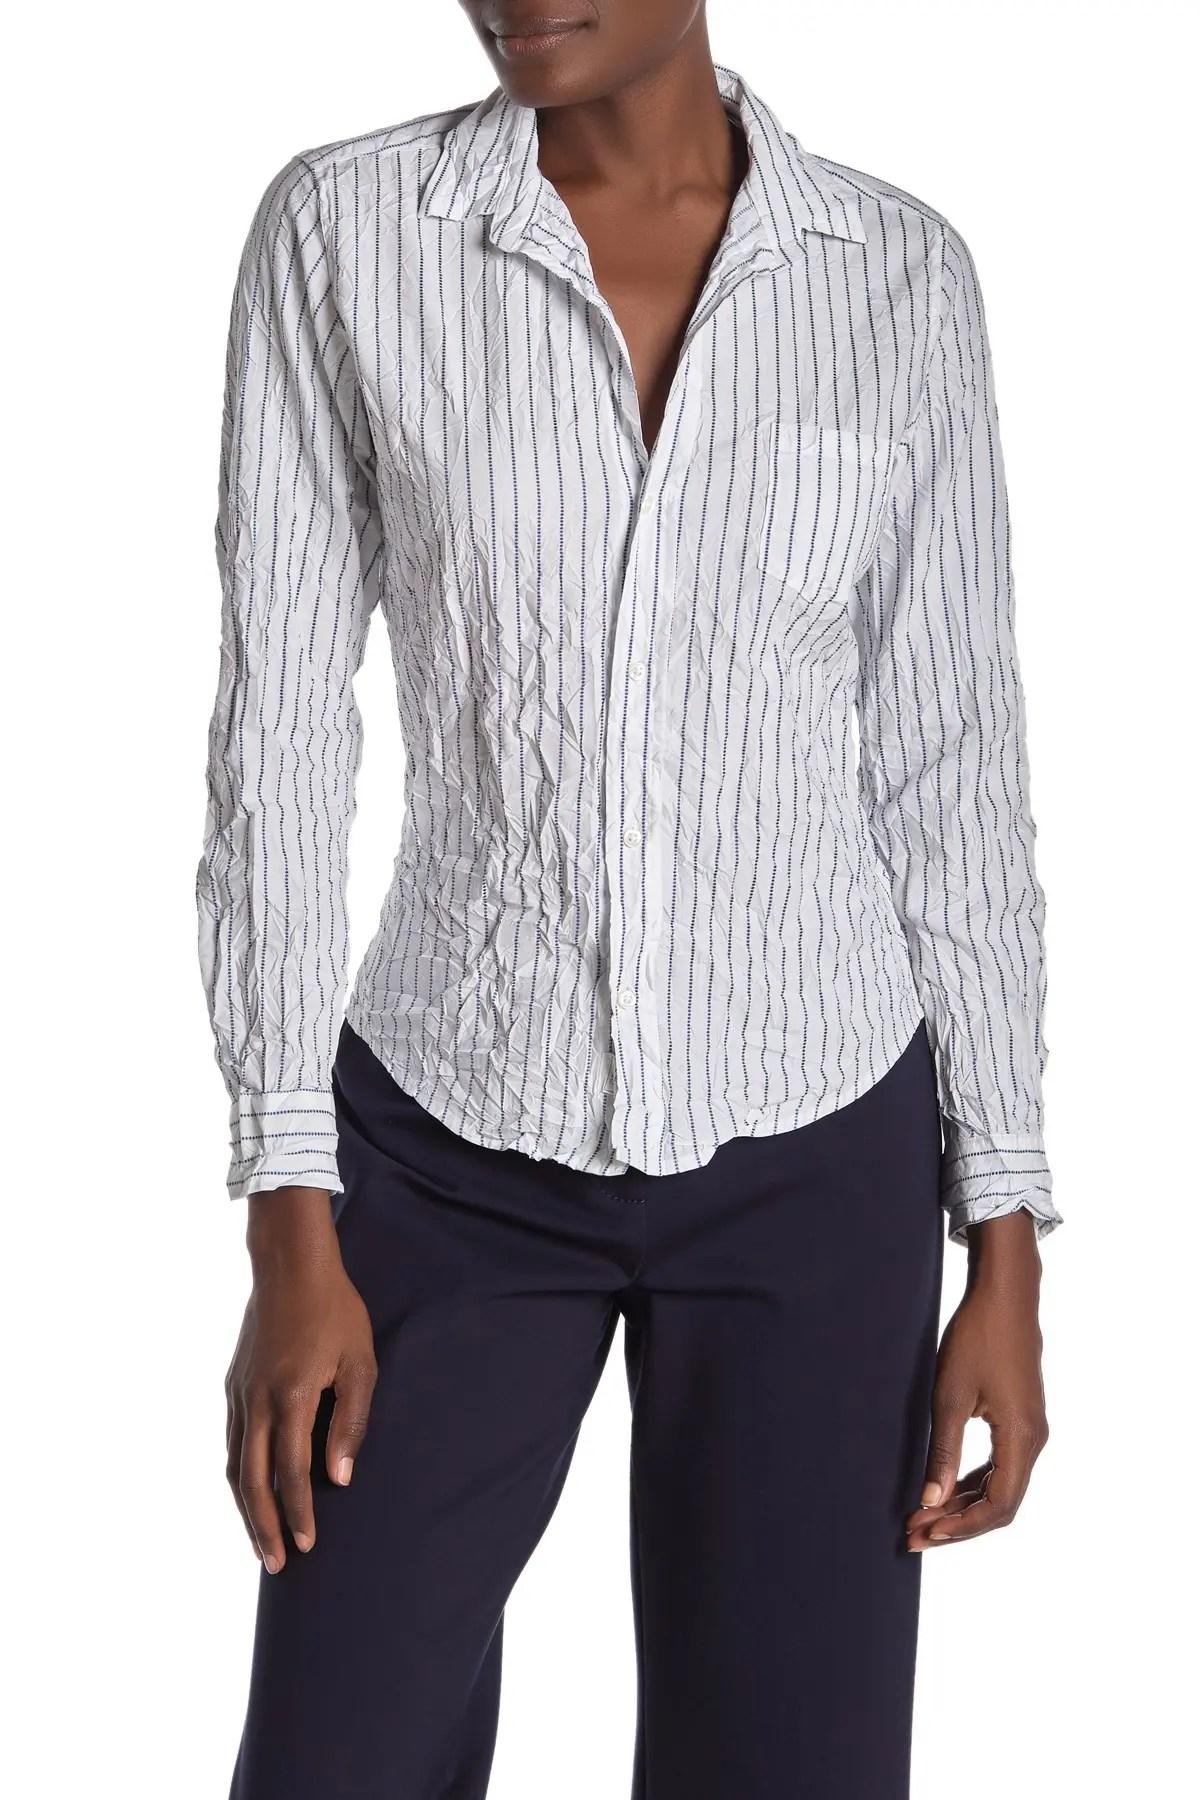 frank eileen barry signature crinkle dot stripe print shirt nordstrom rack